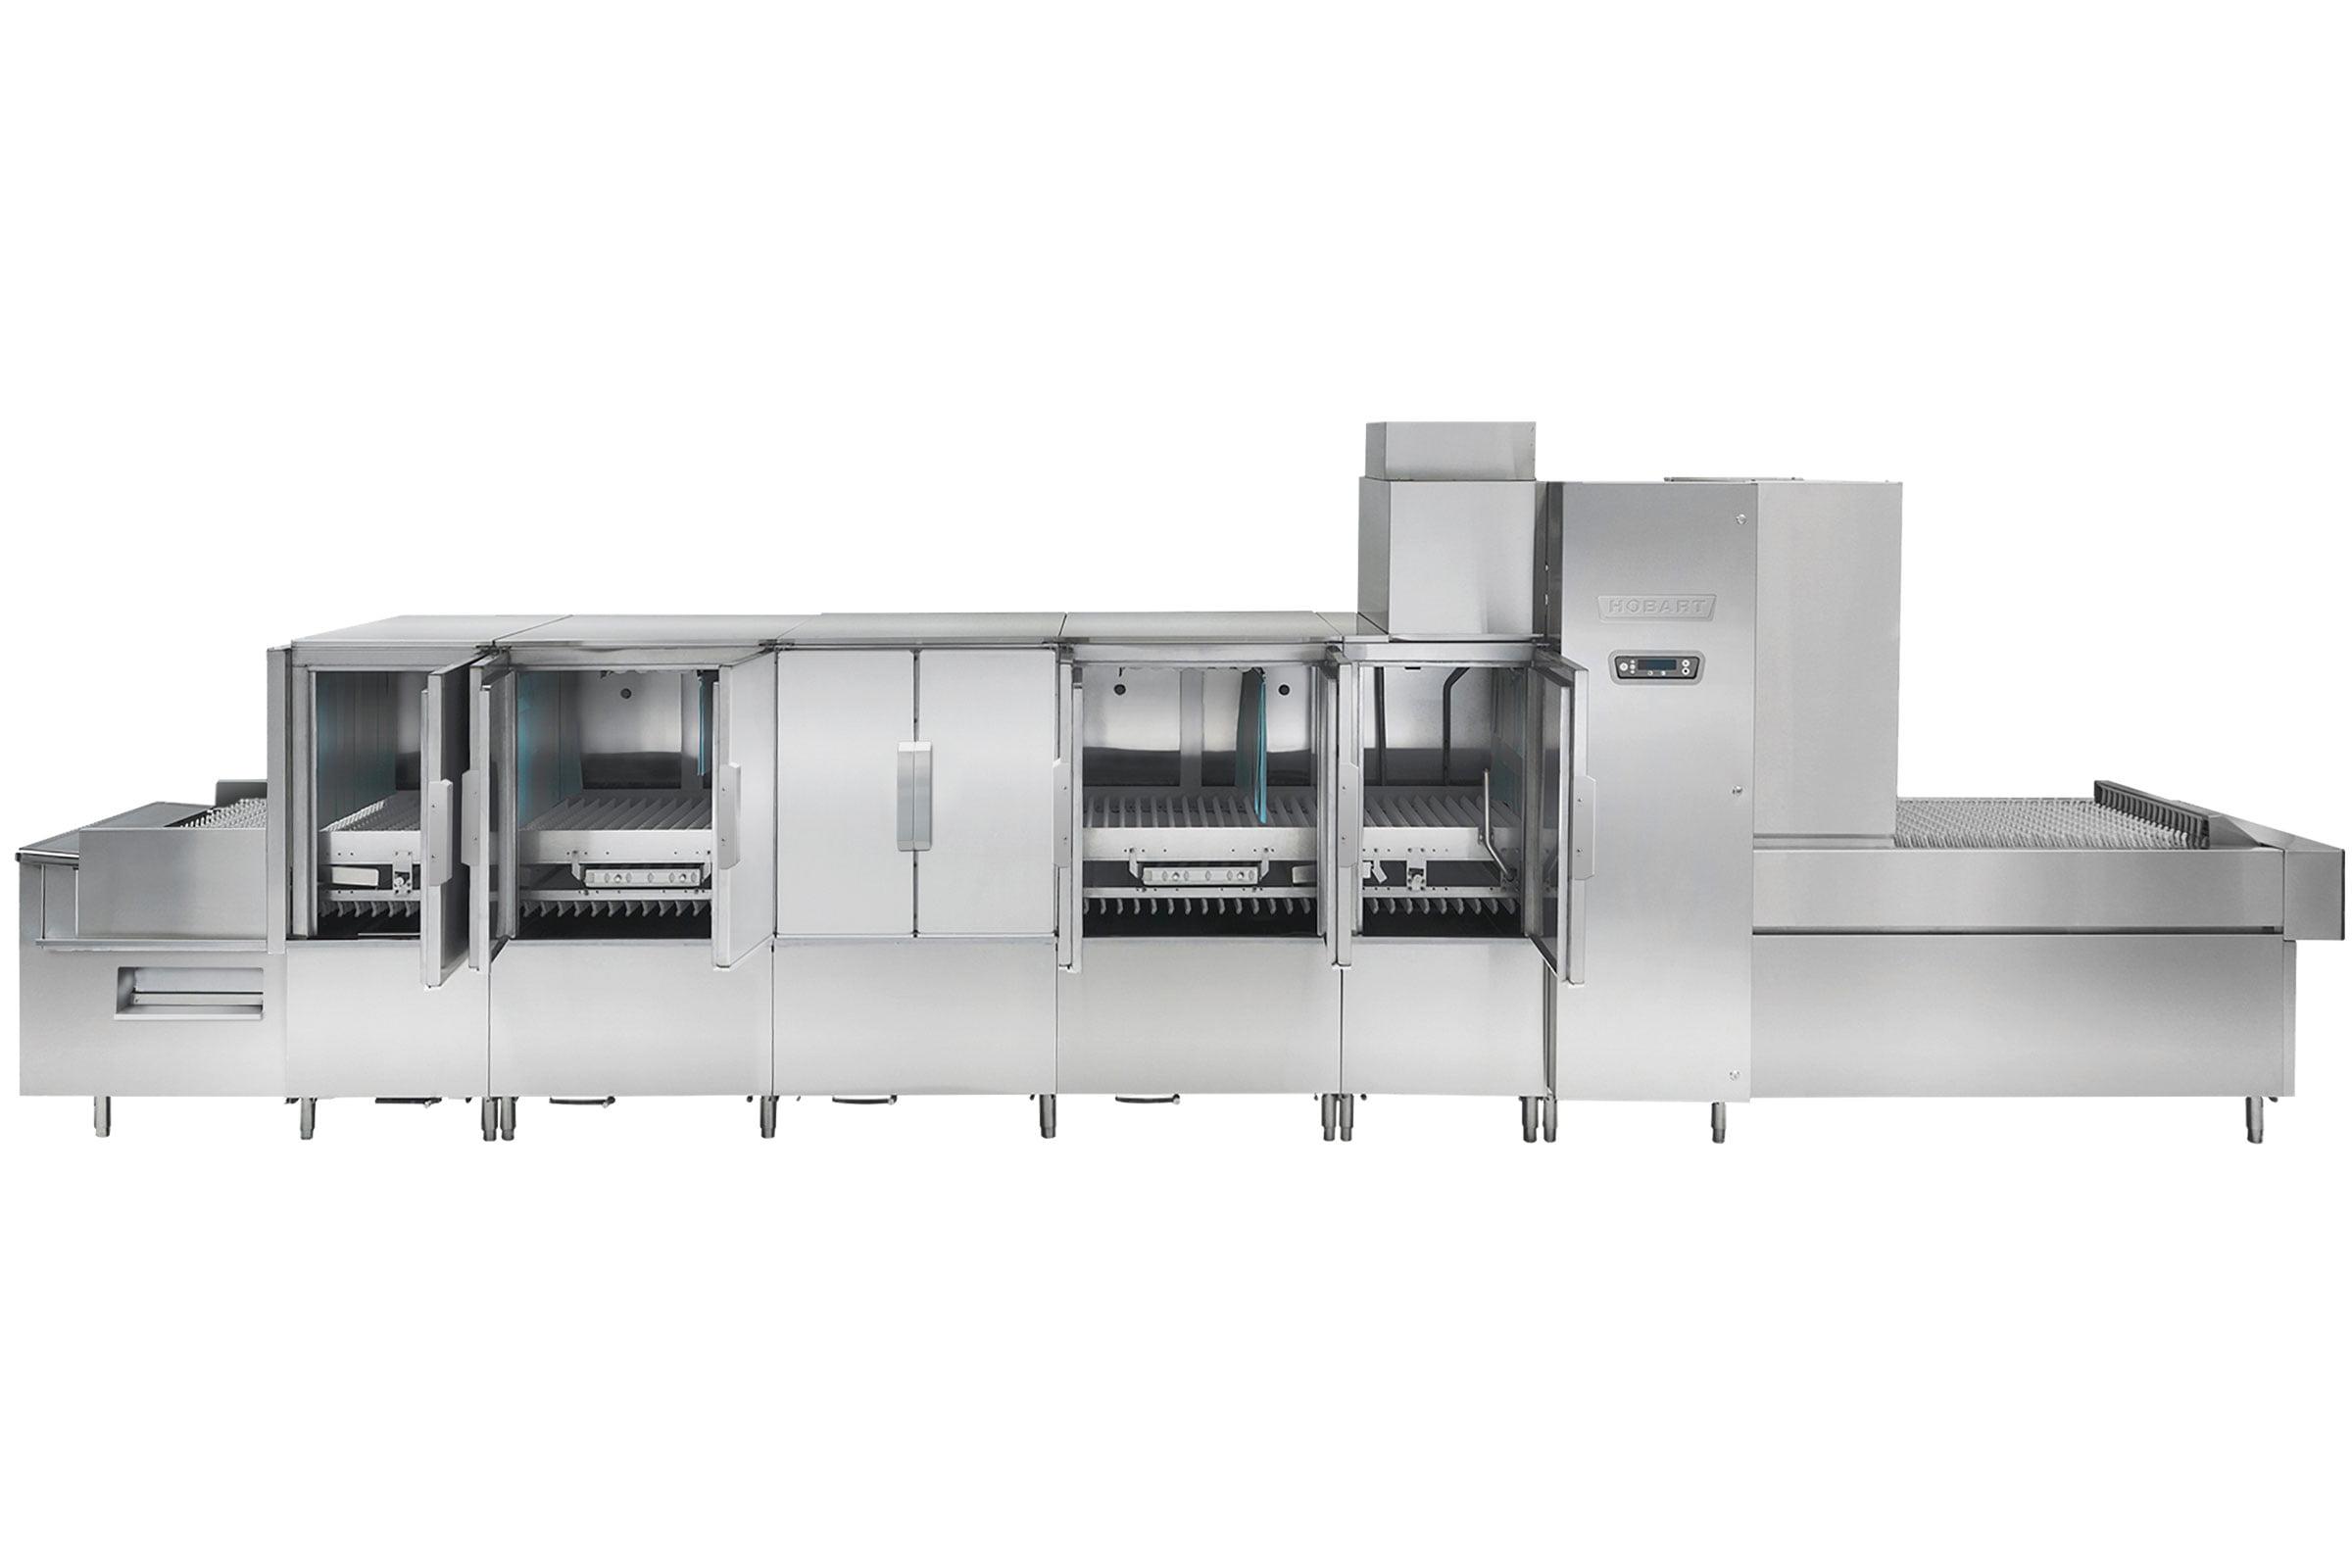 FT1000e Flight Type Commercial Dishwasher Open